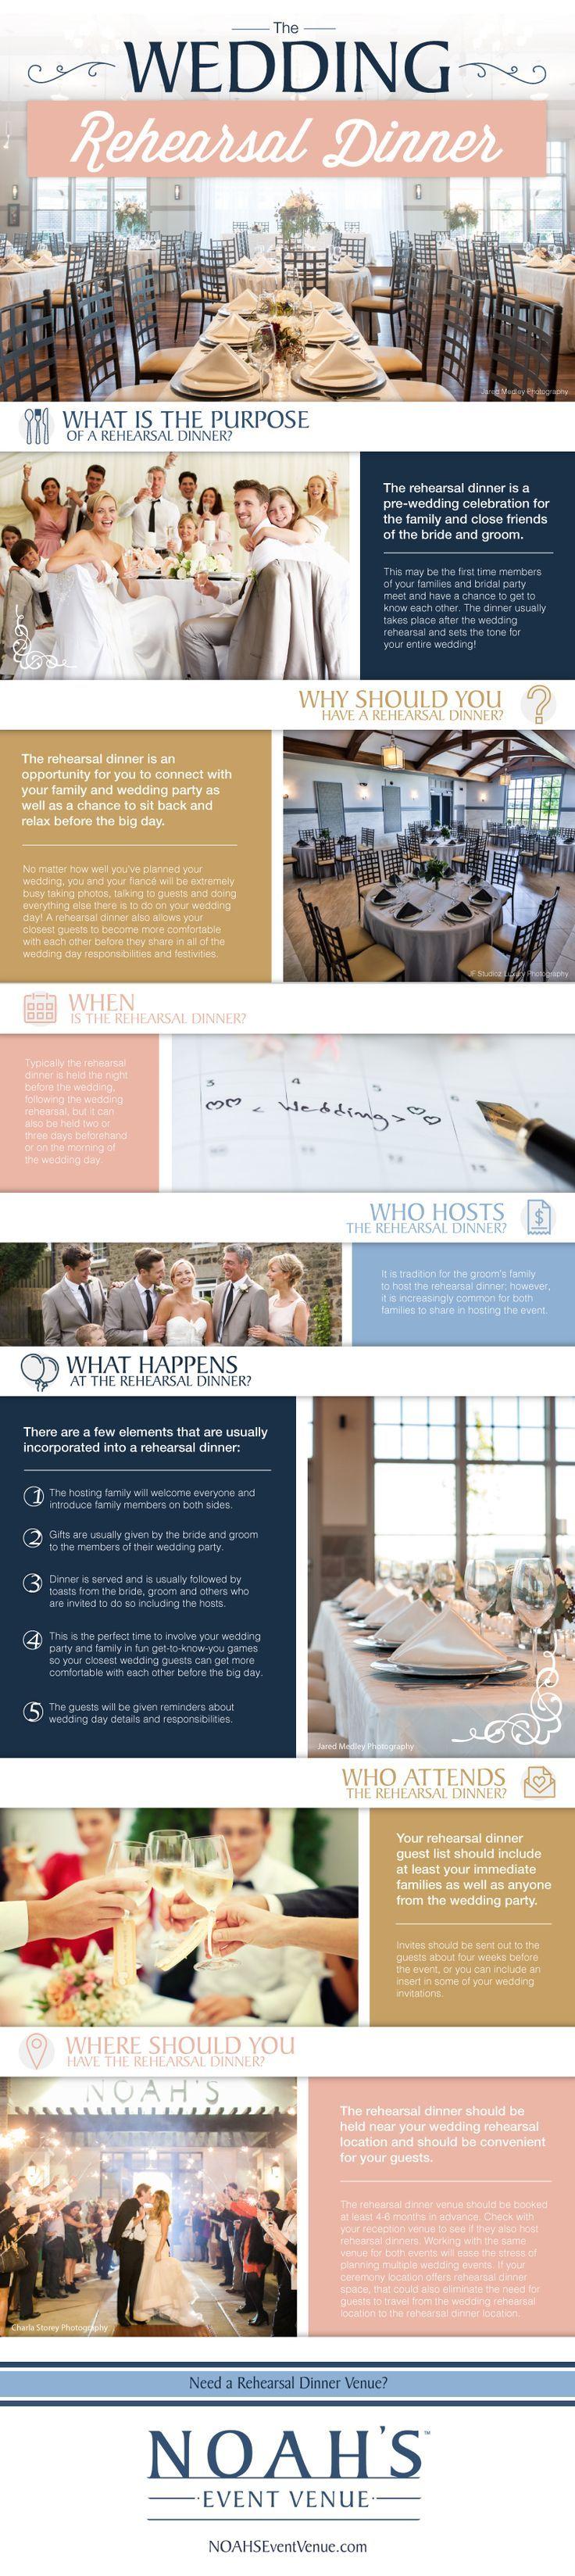 The Wedding Rehearsal Dinner | NOAH'S Weddings Blog | http://www.NOAHSWeddings.com